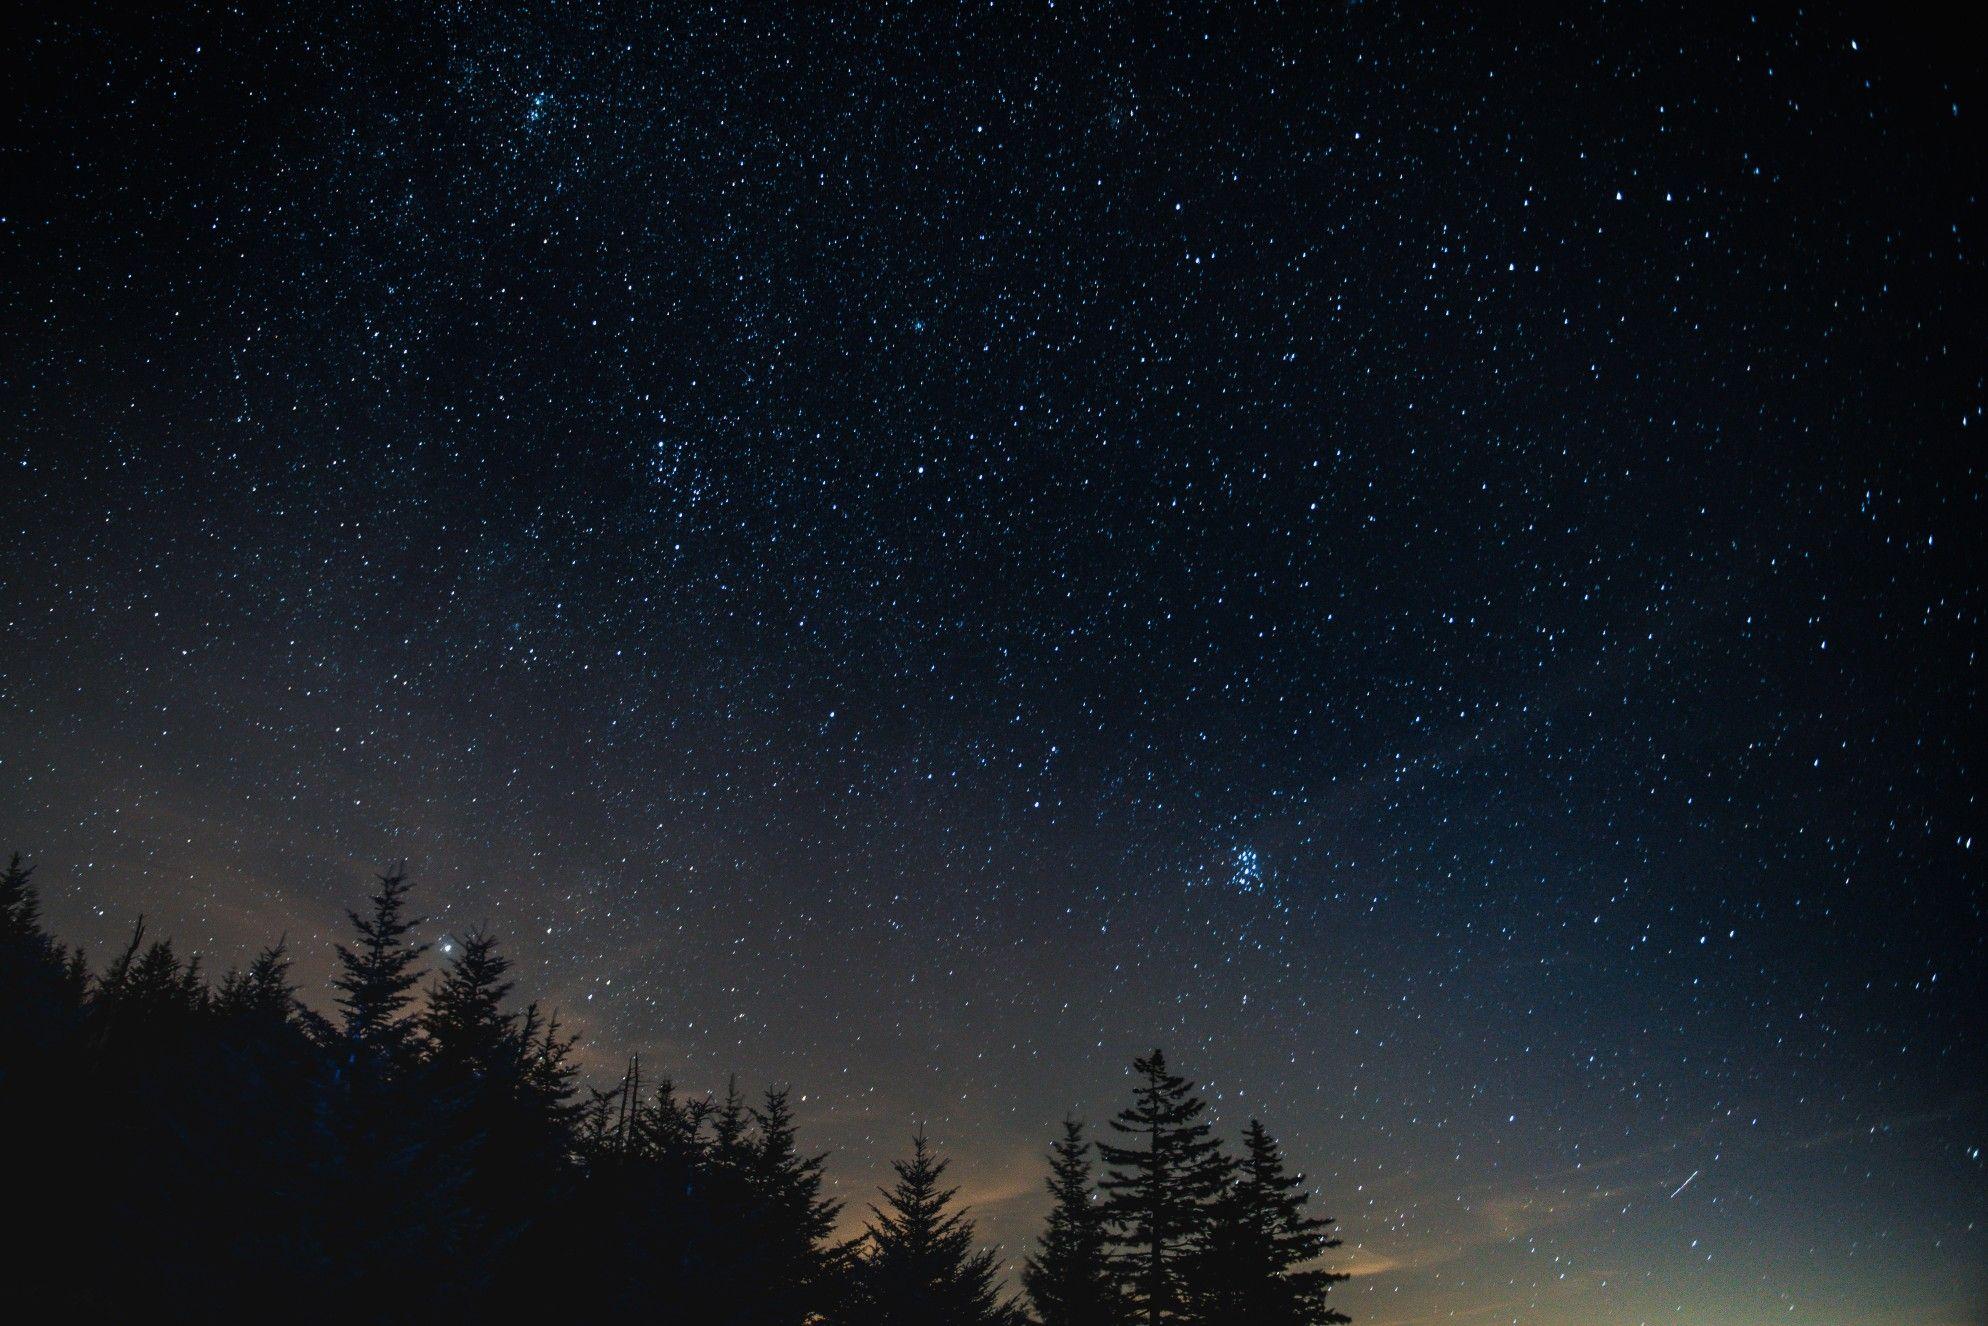 Nice View Night Landscape Silhouette Painting Pine Tree Silhouette